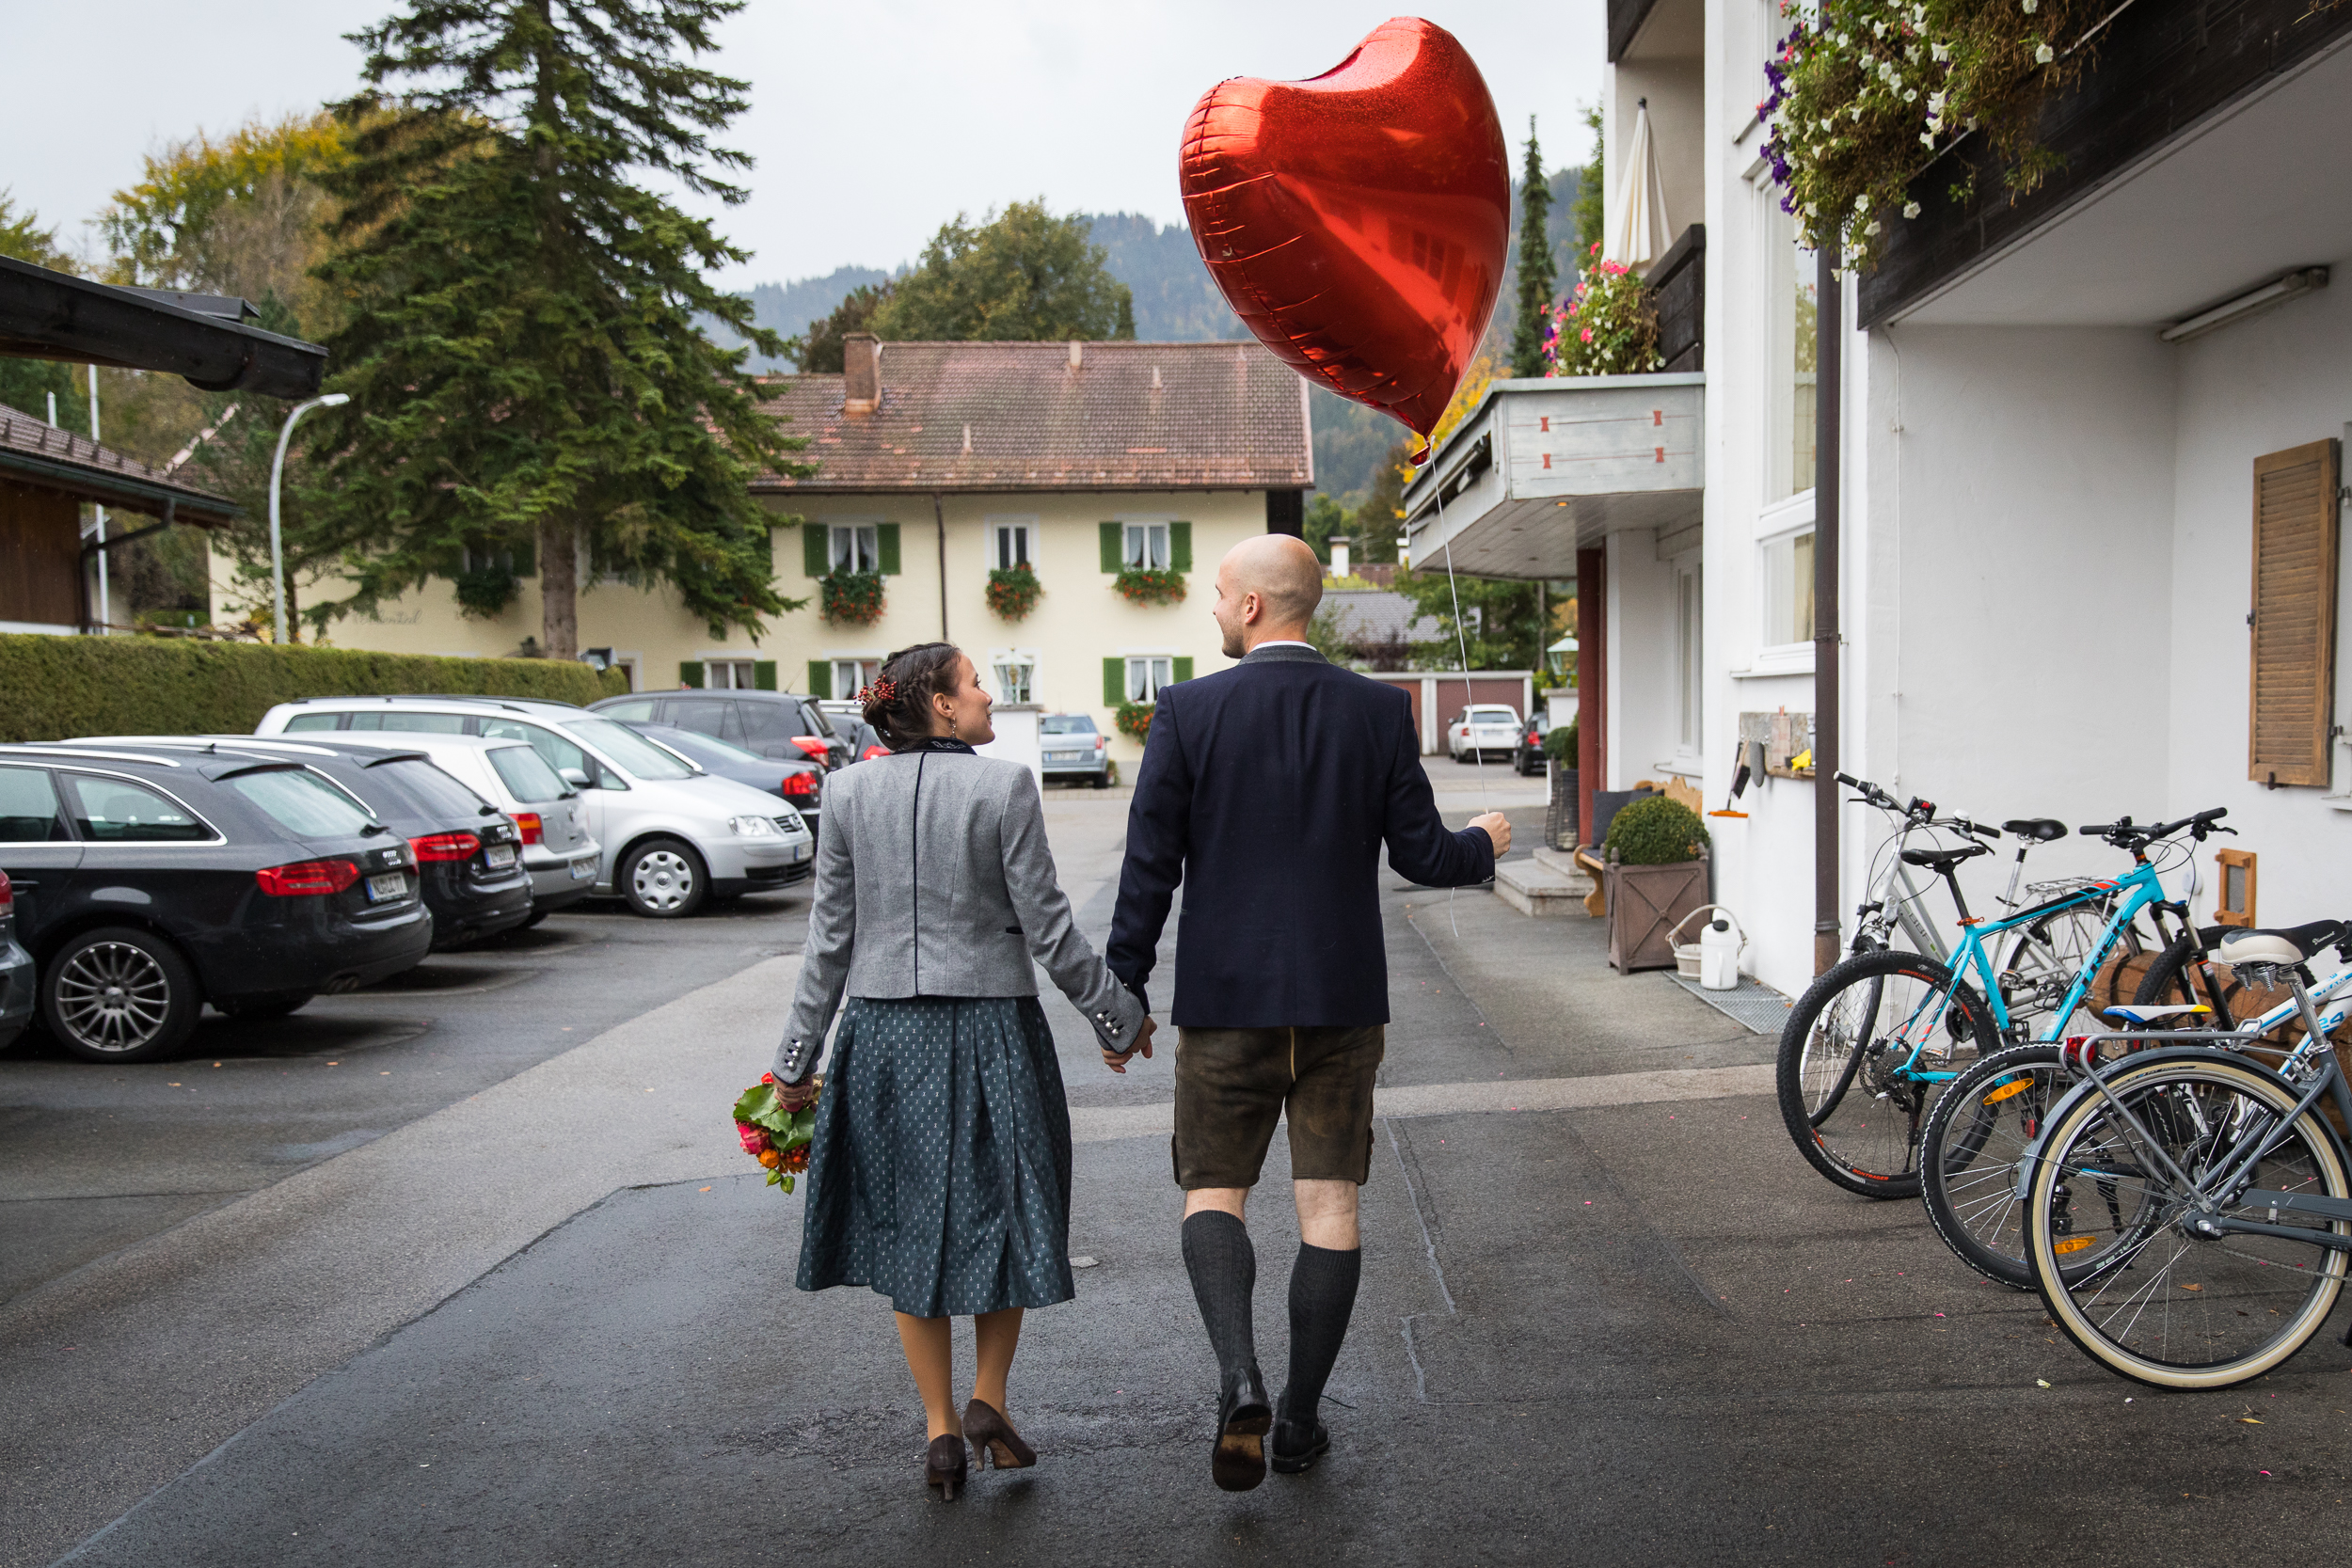 Gregg_Thorne_Wedding_Photographer_Munich_112.jpg